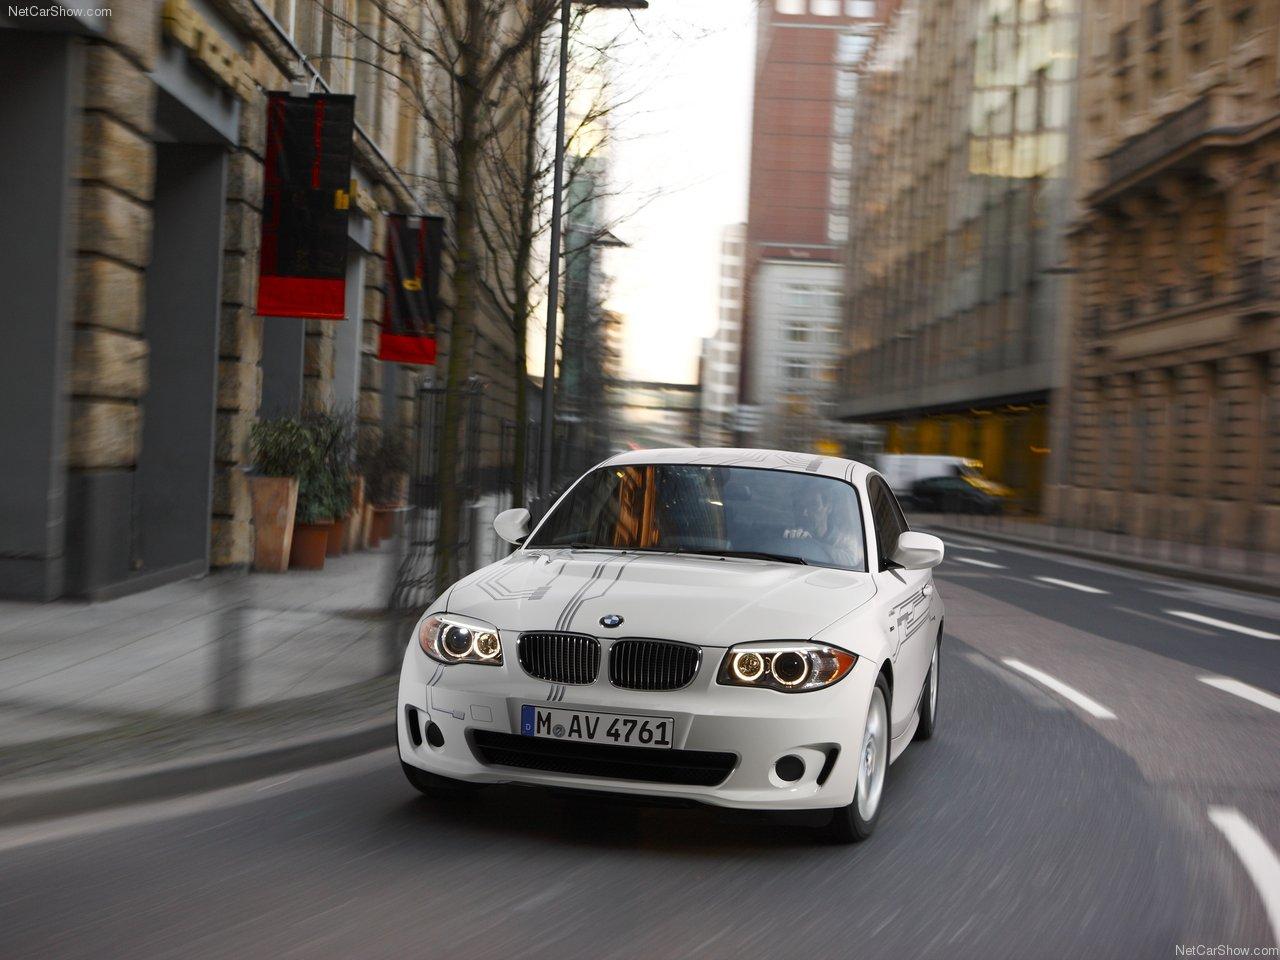 http://4.bp.blogspot.com/-z6AbjGyUO-M/TV3-hvlym5I/AAAAAAAAD9w/_GmLjCRnq4Q/s1600/BMW-ActiveE_Concept_2011_1280x960_wallpaper_03.jpg